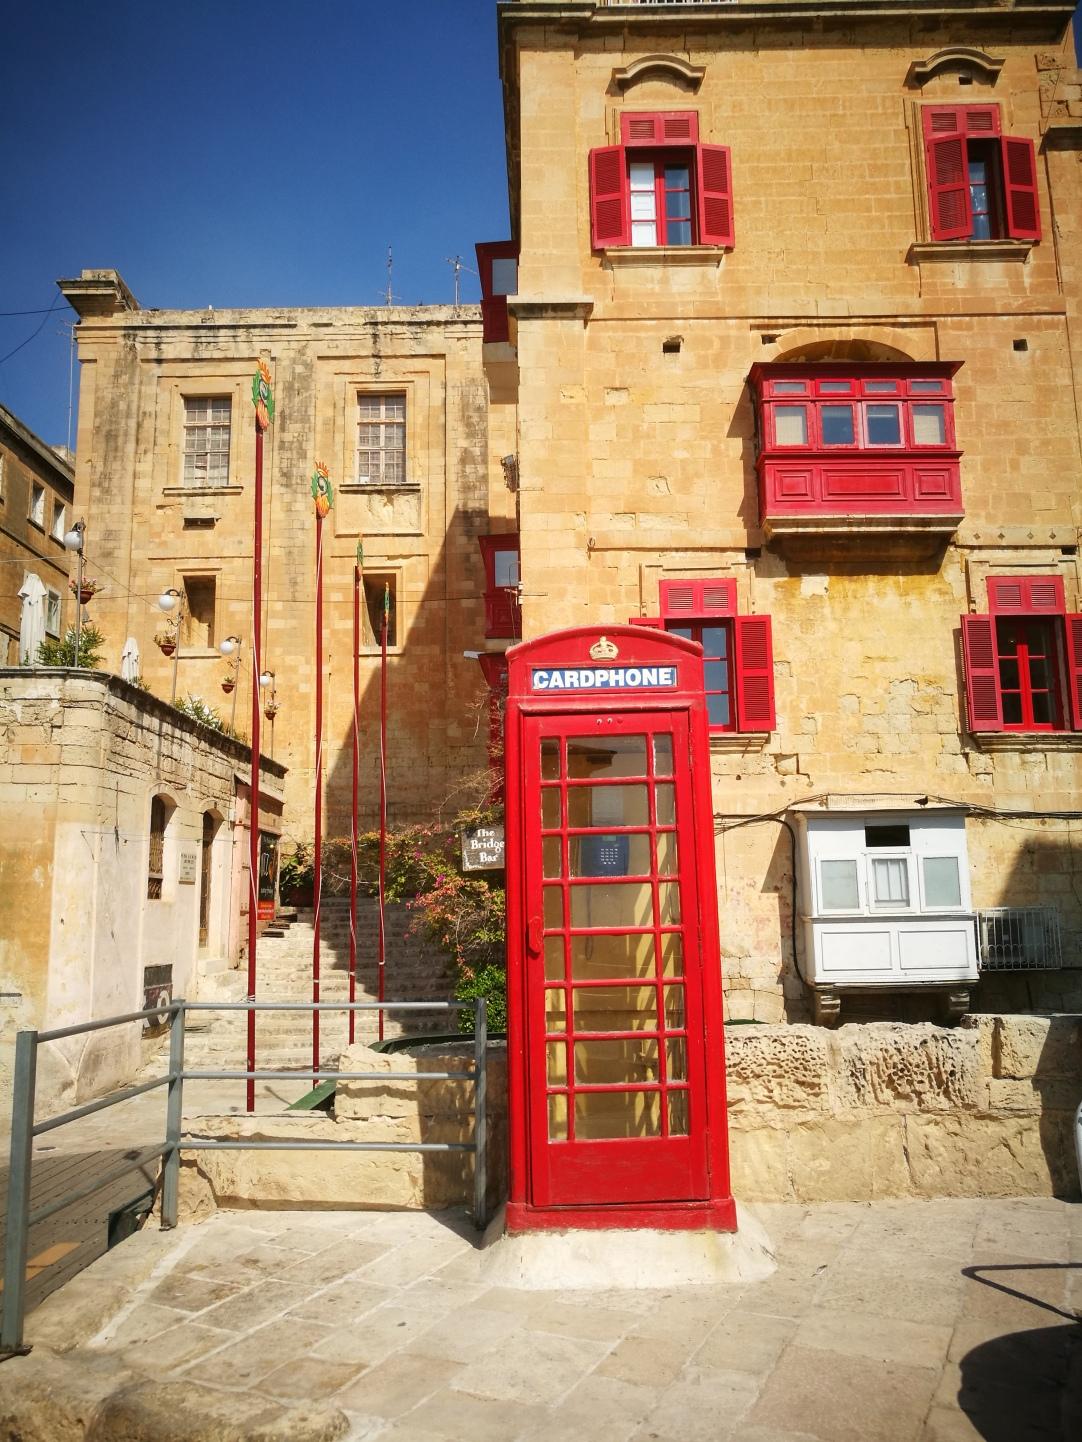 La Valletta - Cardphone